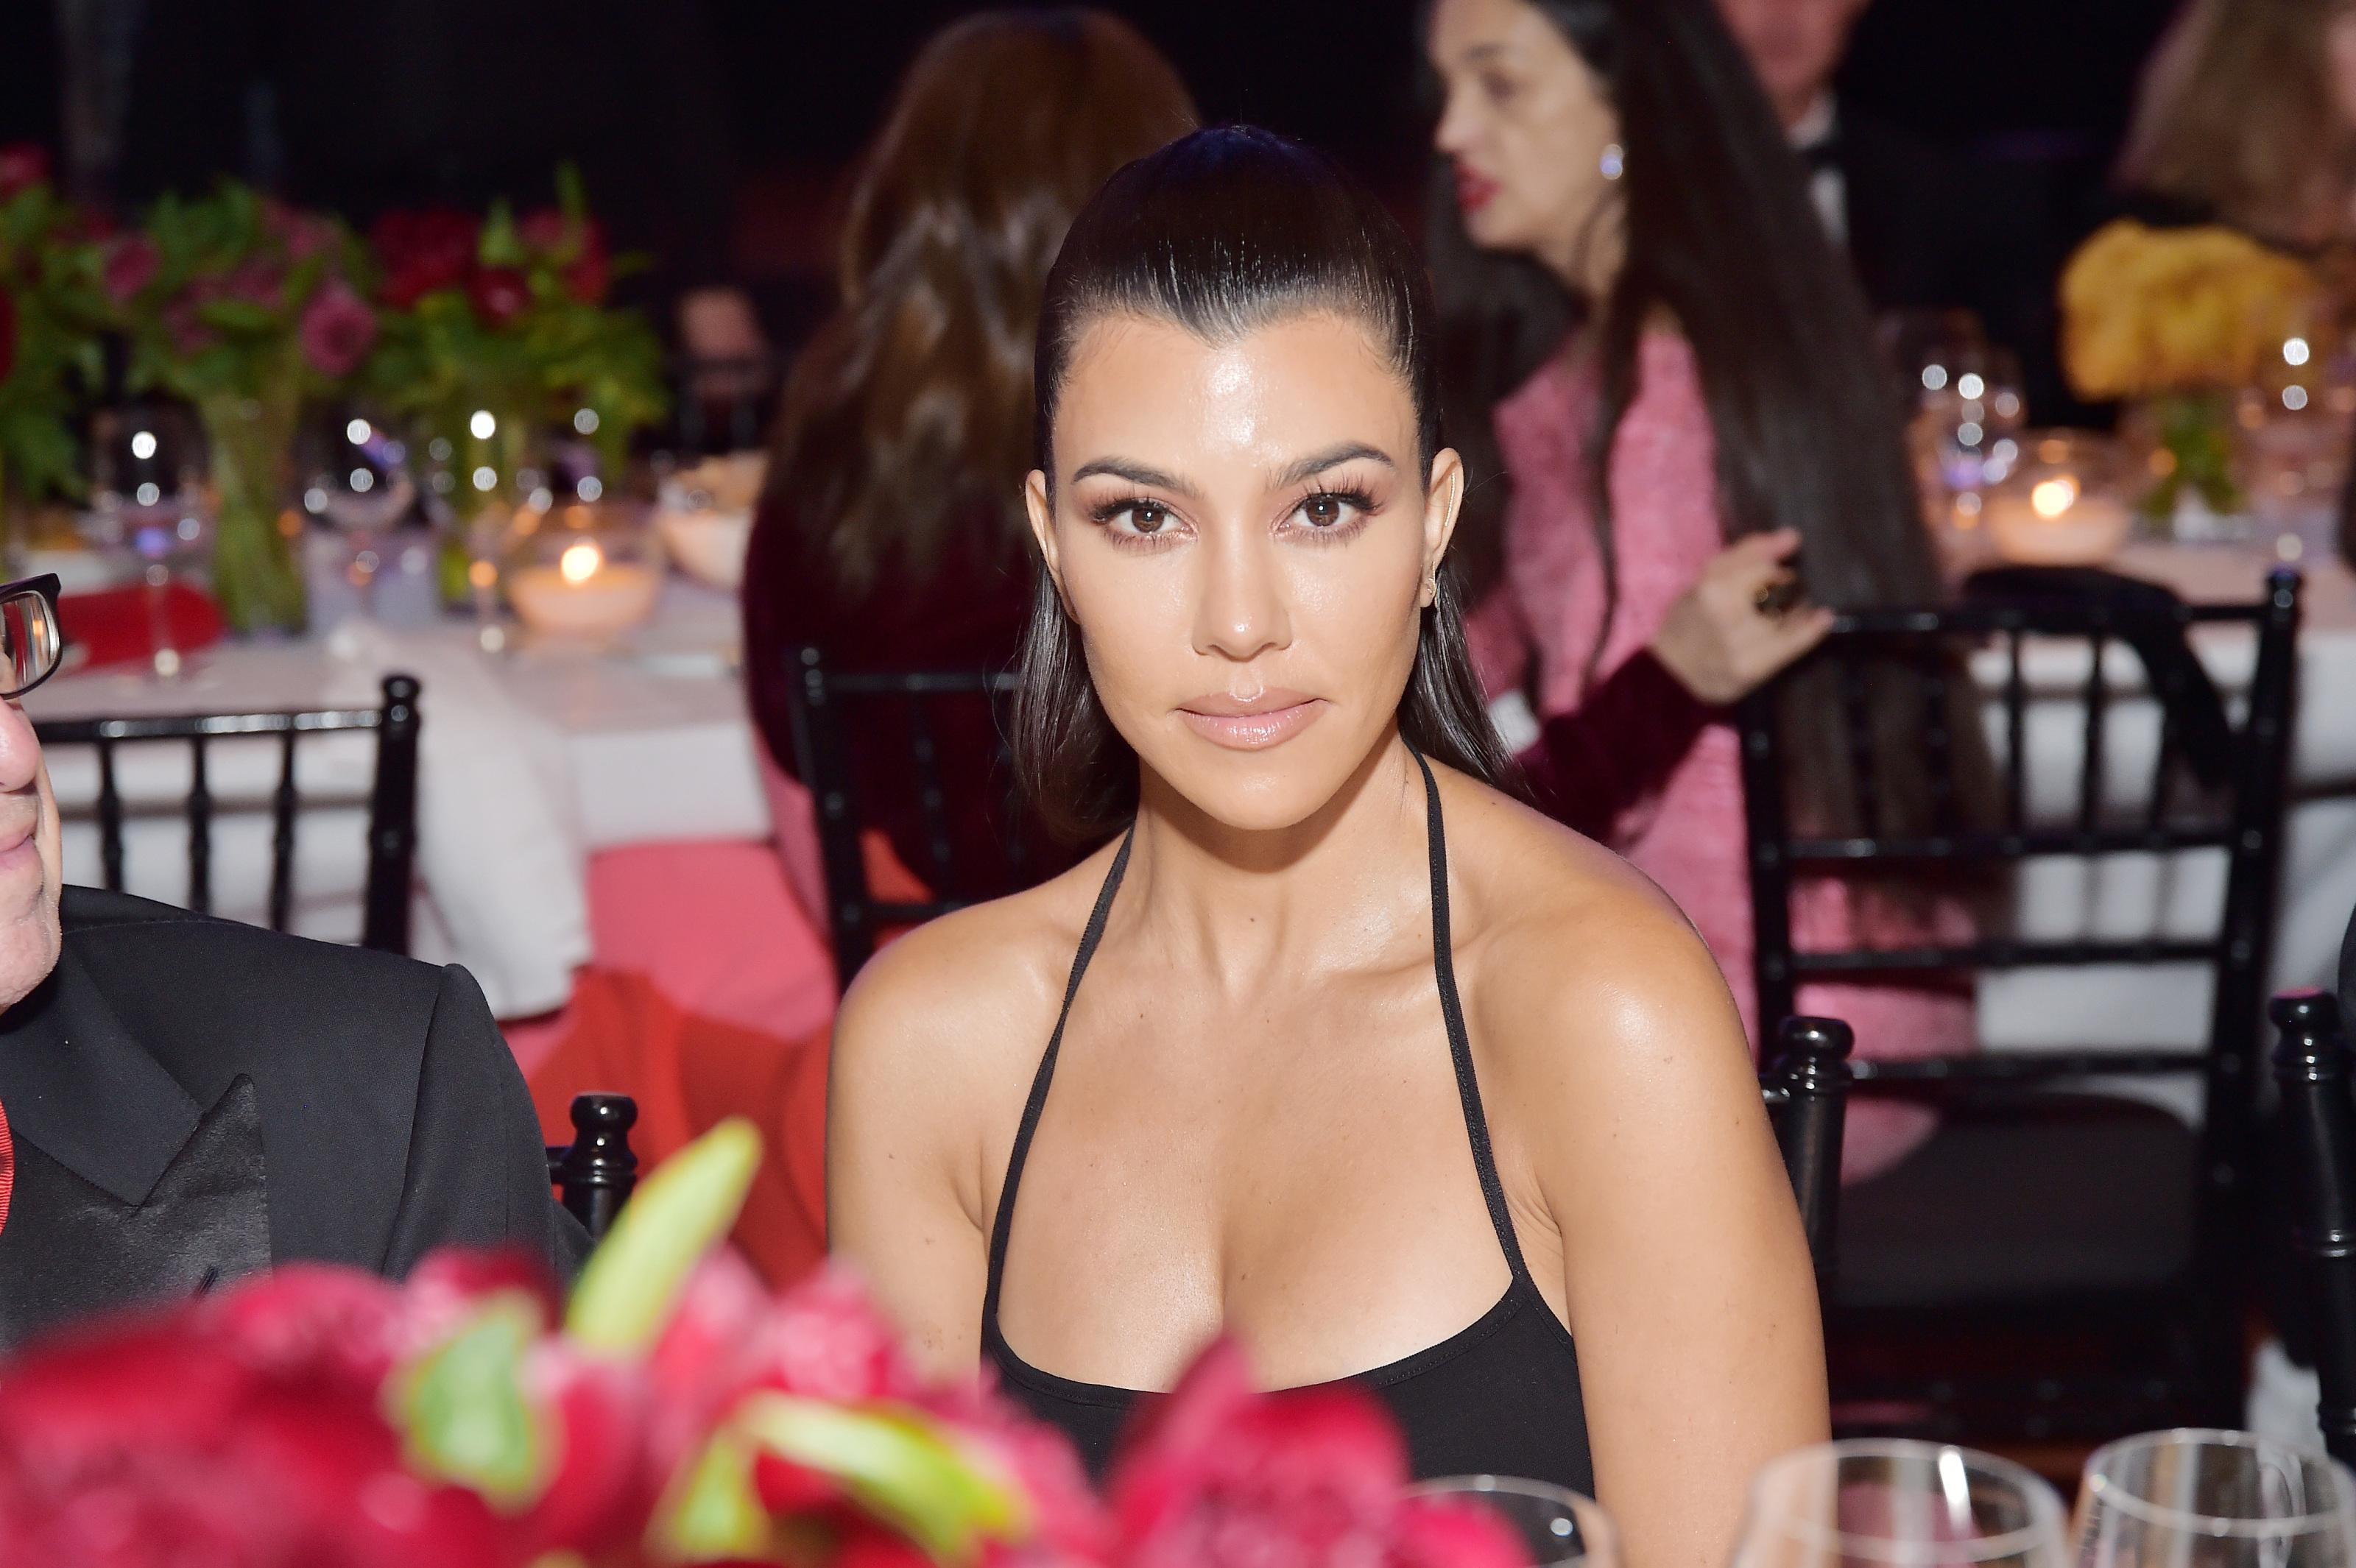 Marvelous Kourtney Kardashian Celebrates Birthday With Rainbow Explosion Funny Birthday Cards Online Fluifree Goldxyz